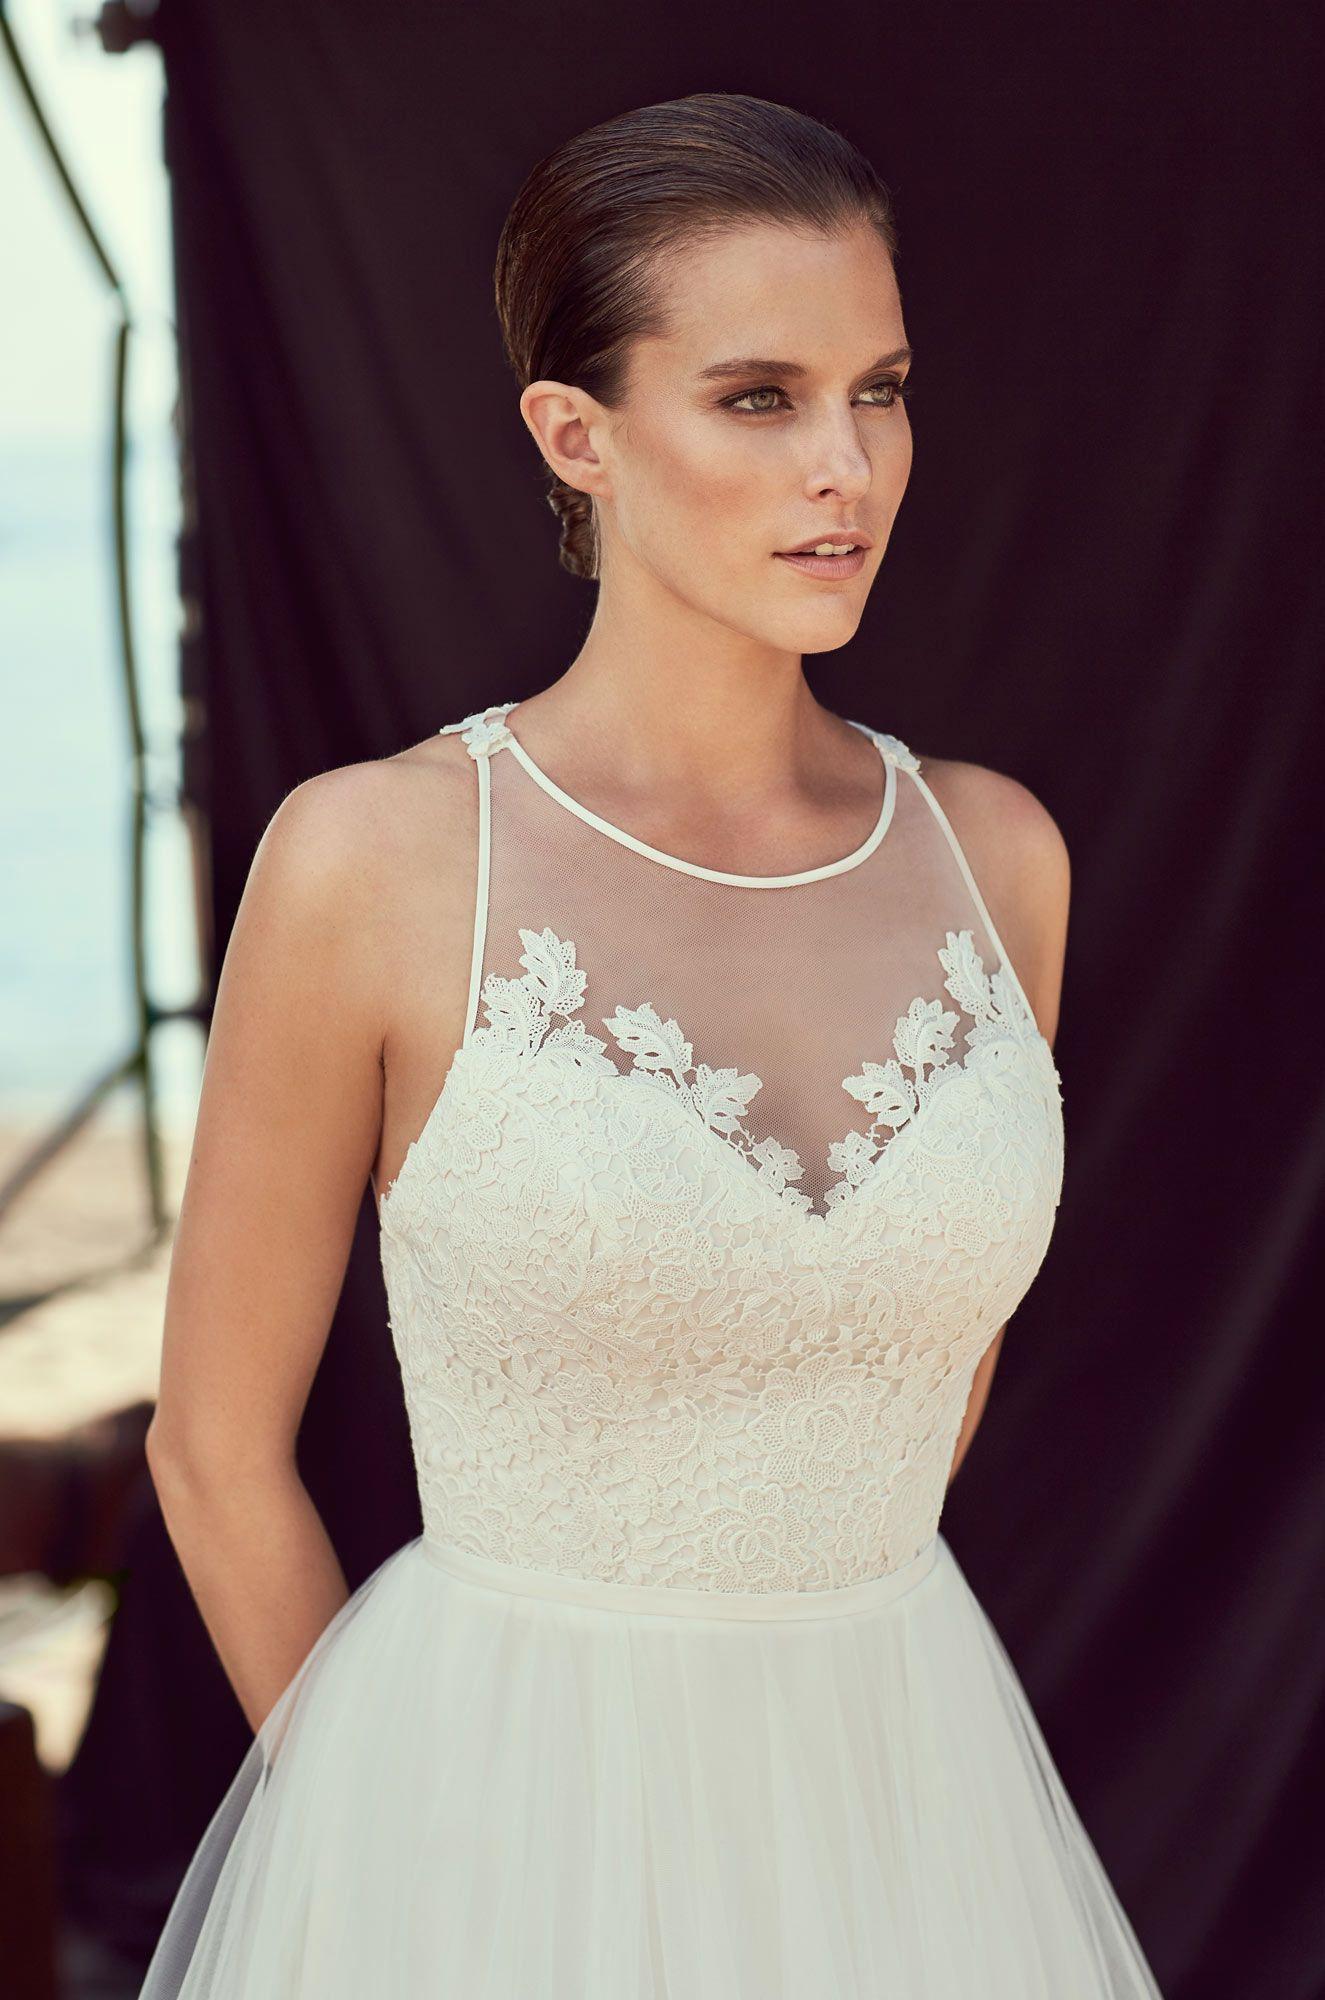 Lace racerback wedding dress style lace bodice tulle